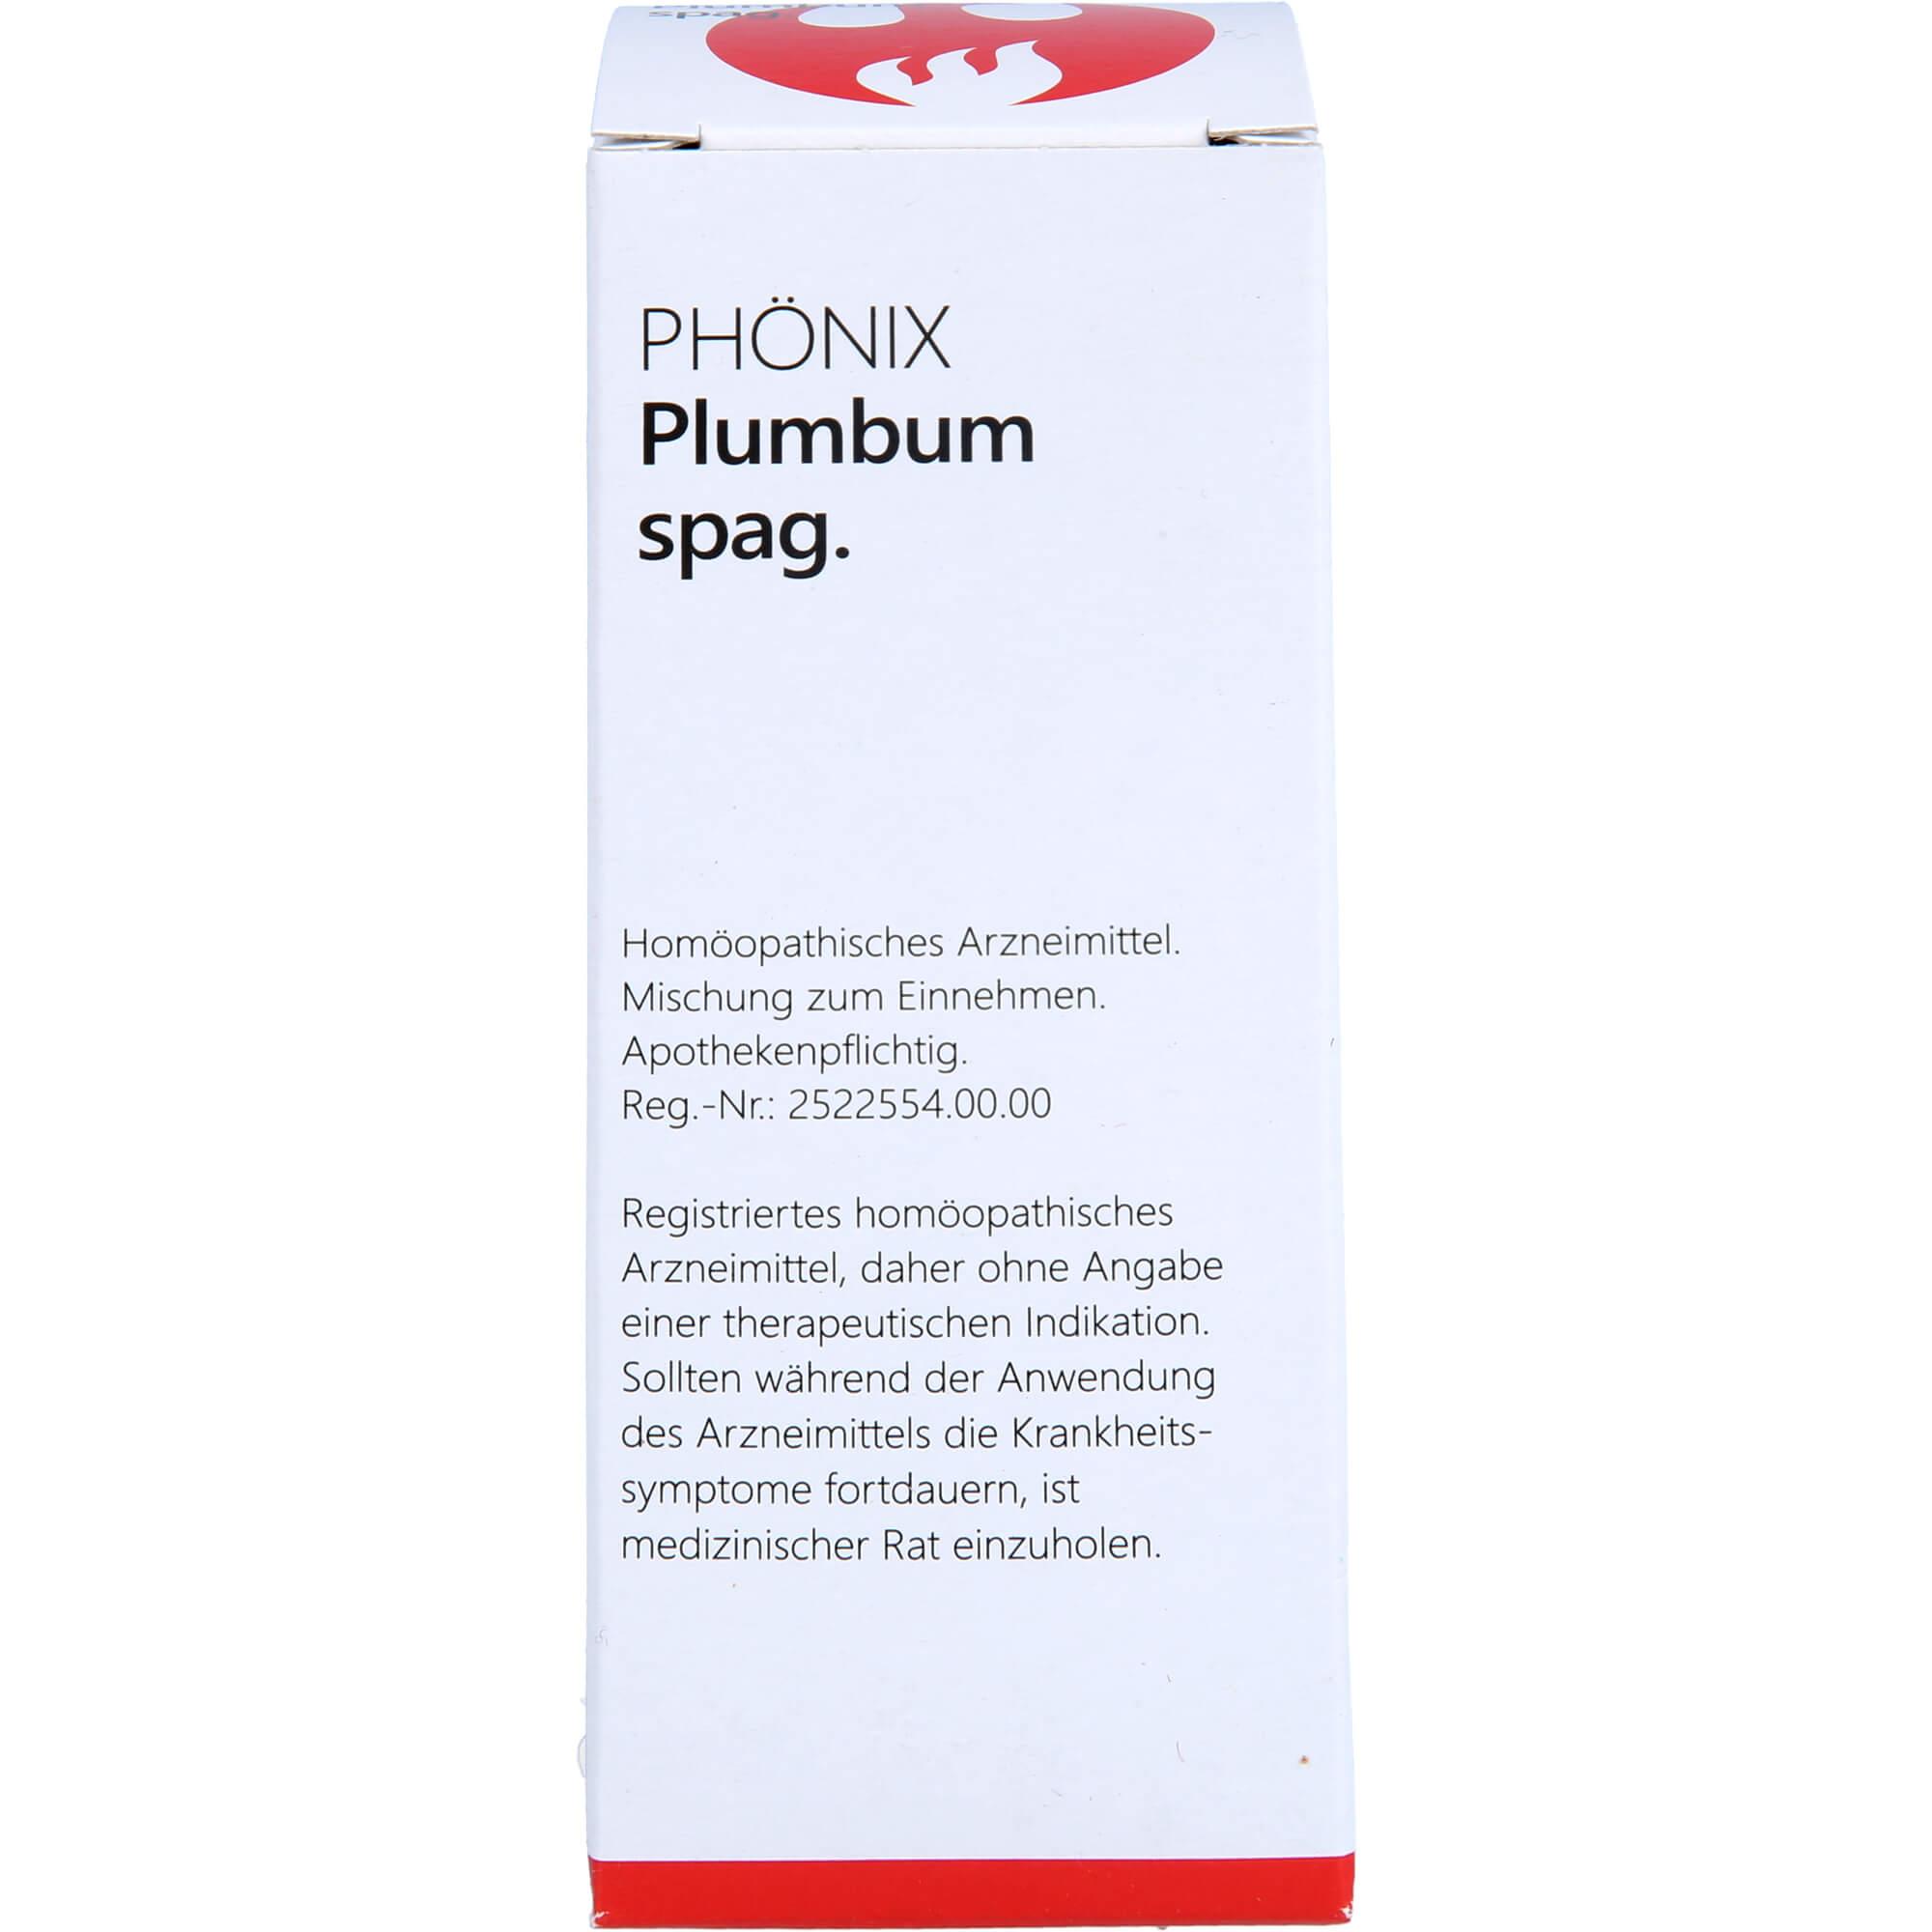 PHOeNIX-PLUMBUM-spag-Mischung